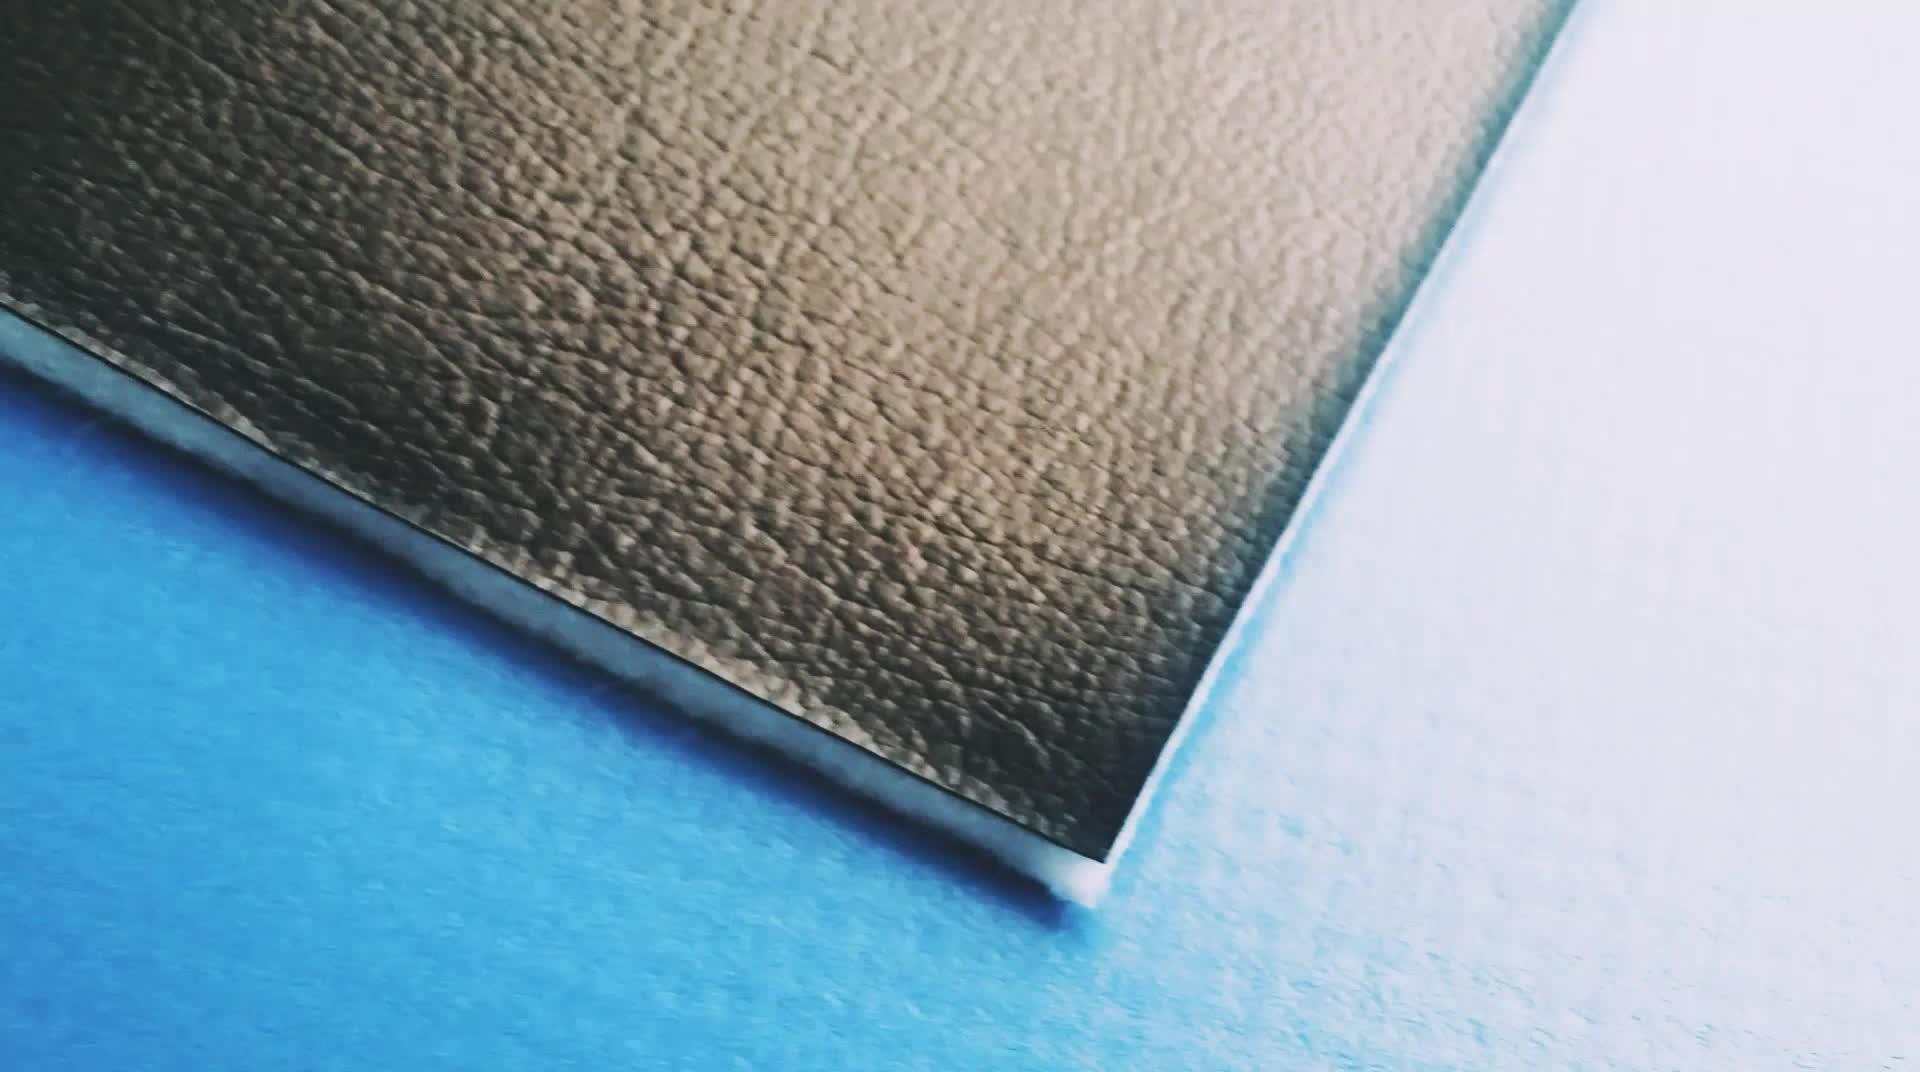 Multi-pattern PVC placemat or table leg protectors